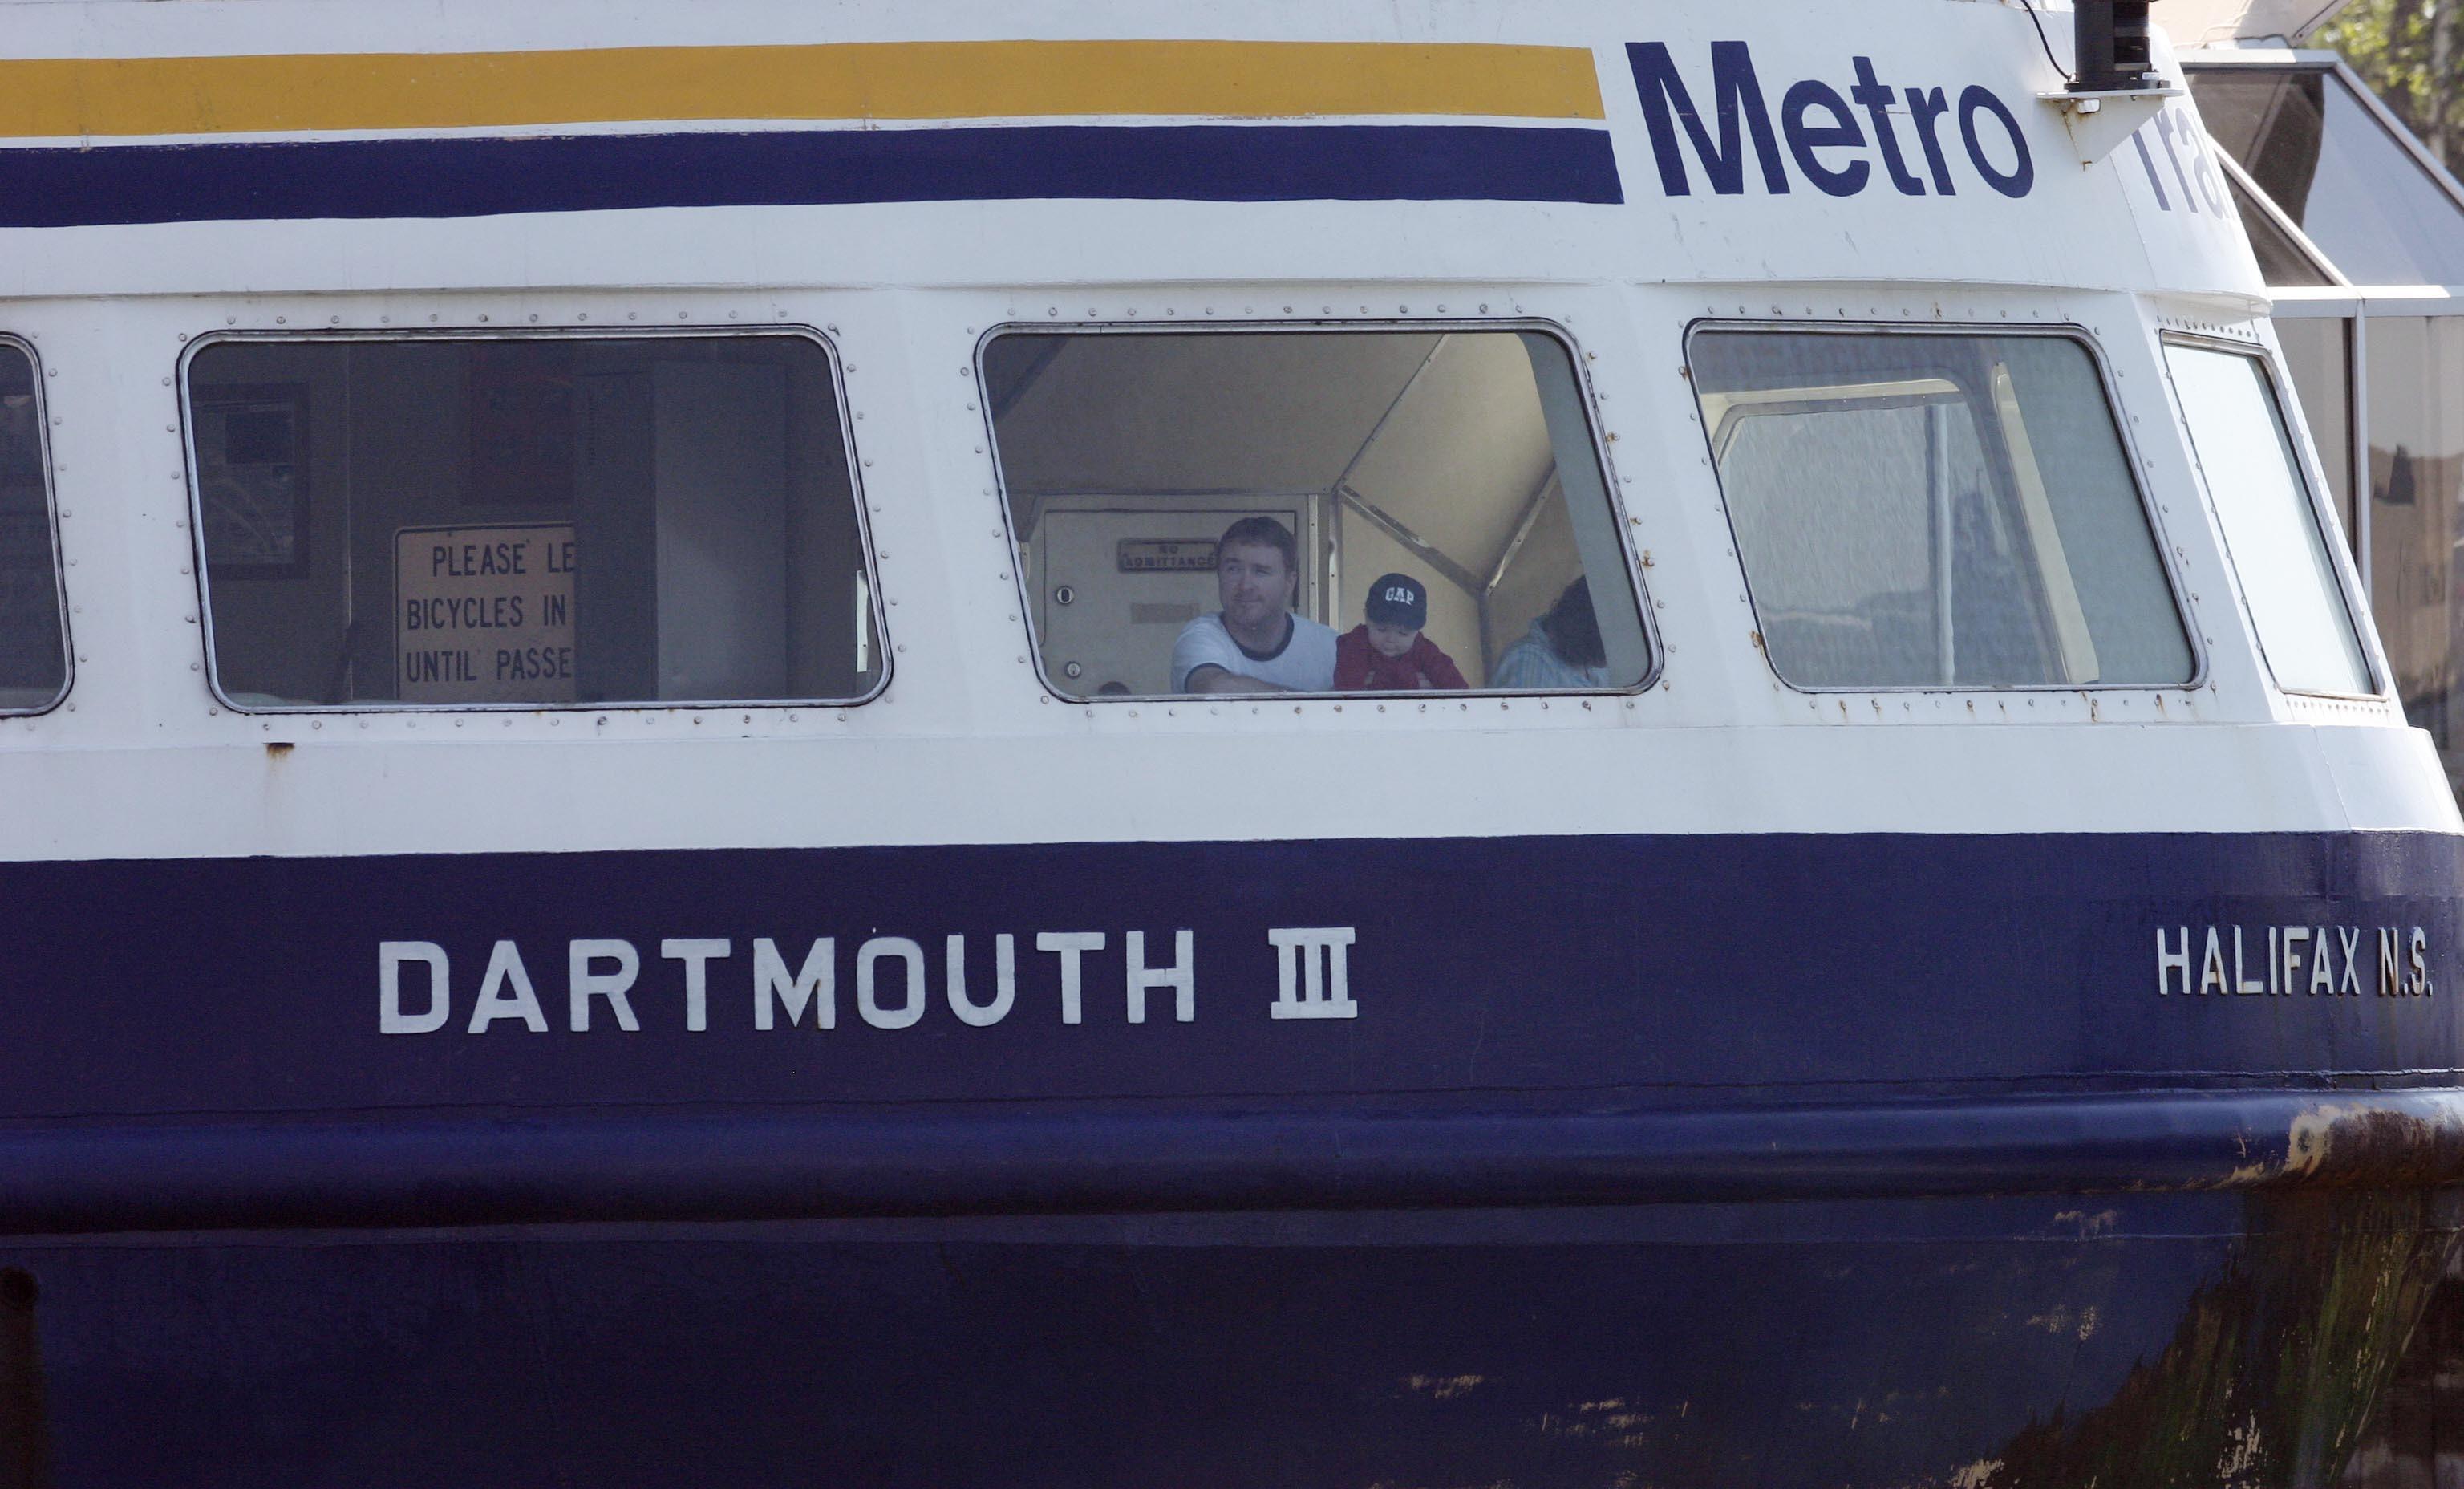 MH_DartmouthFerry.jpg